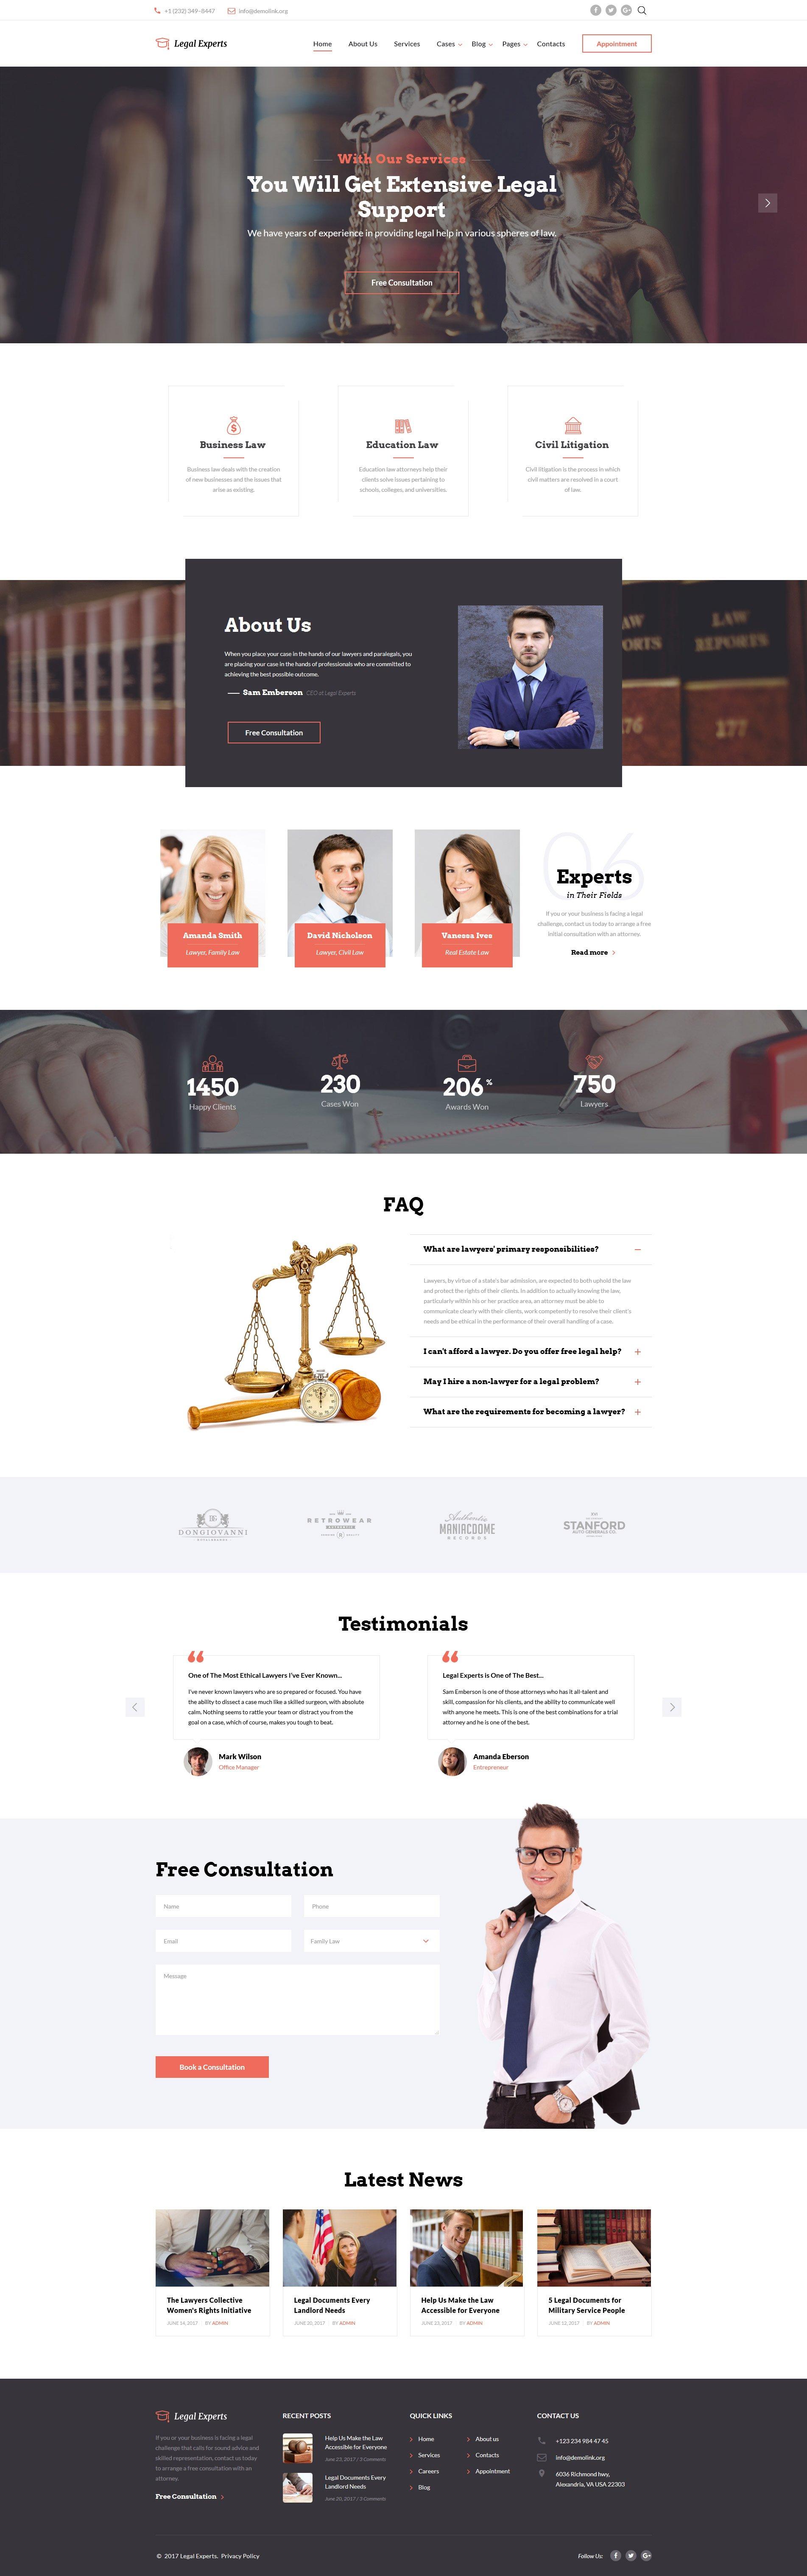 Traffic Ticket Attorney Website Template - screenshot